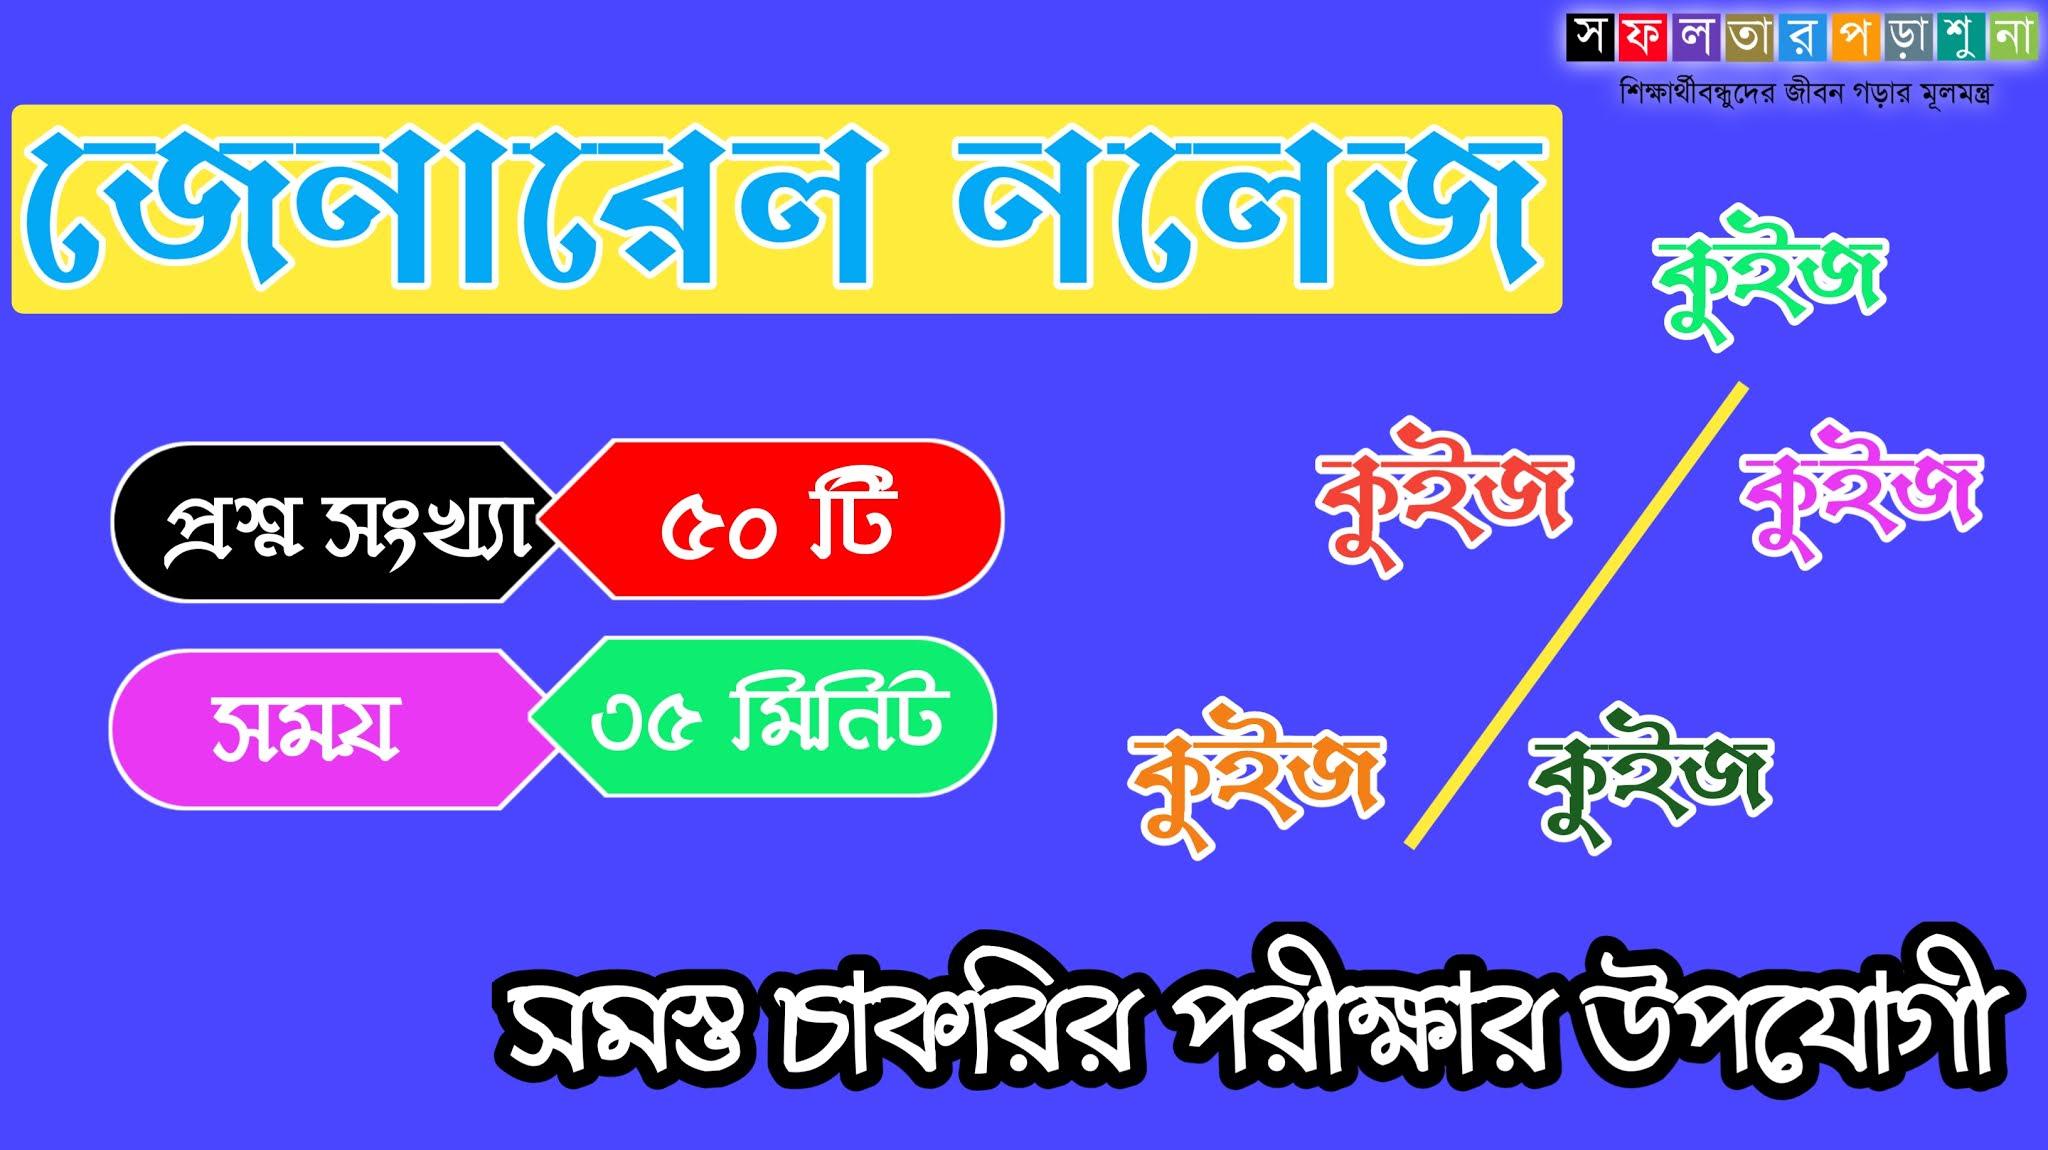 Online Mock Test On General Knowledge In Bengali (Part-2) For All Competitive Exams ।। অনলাইন মকটেস্ট - জেনারেল নলেজ